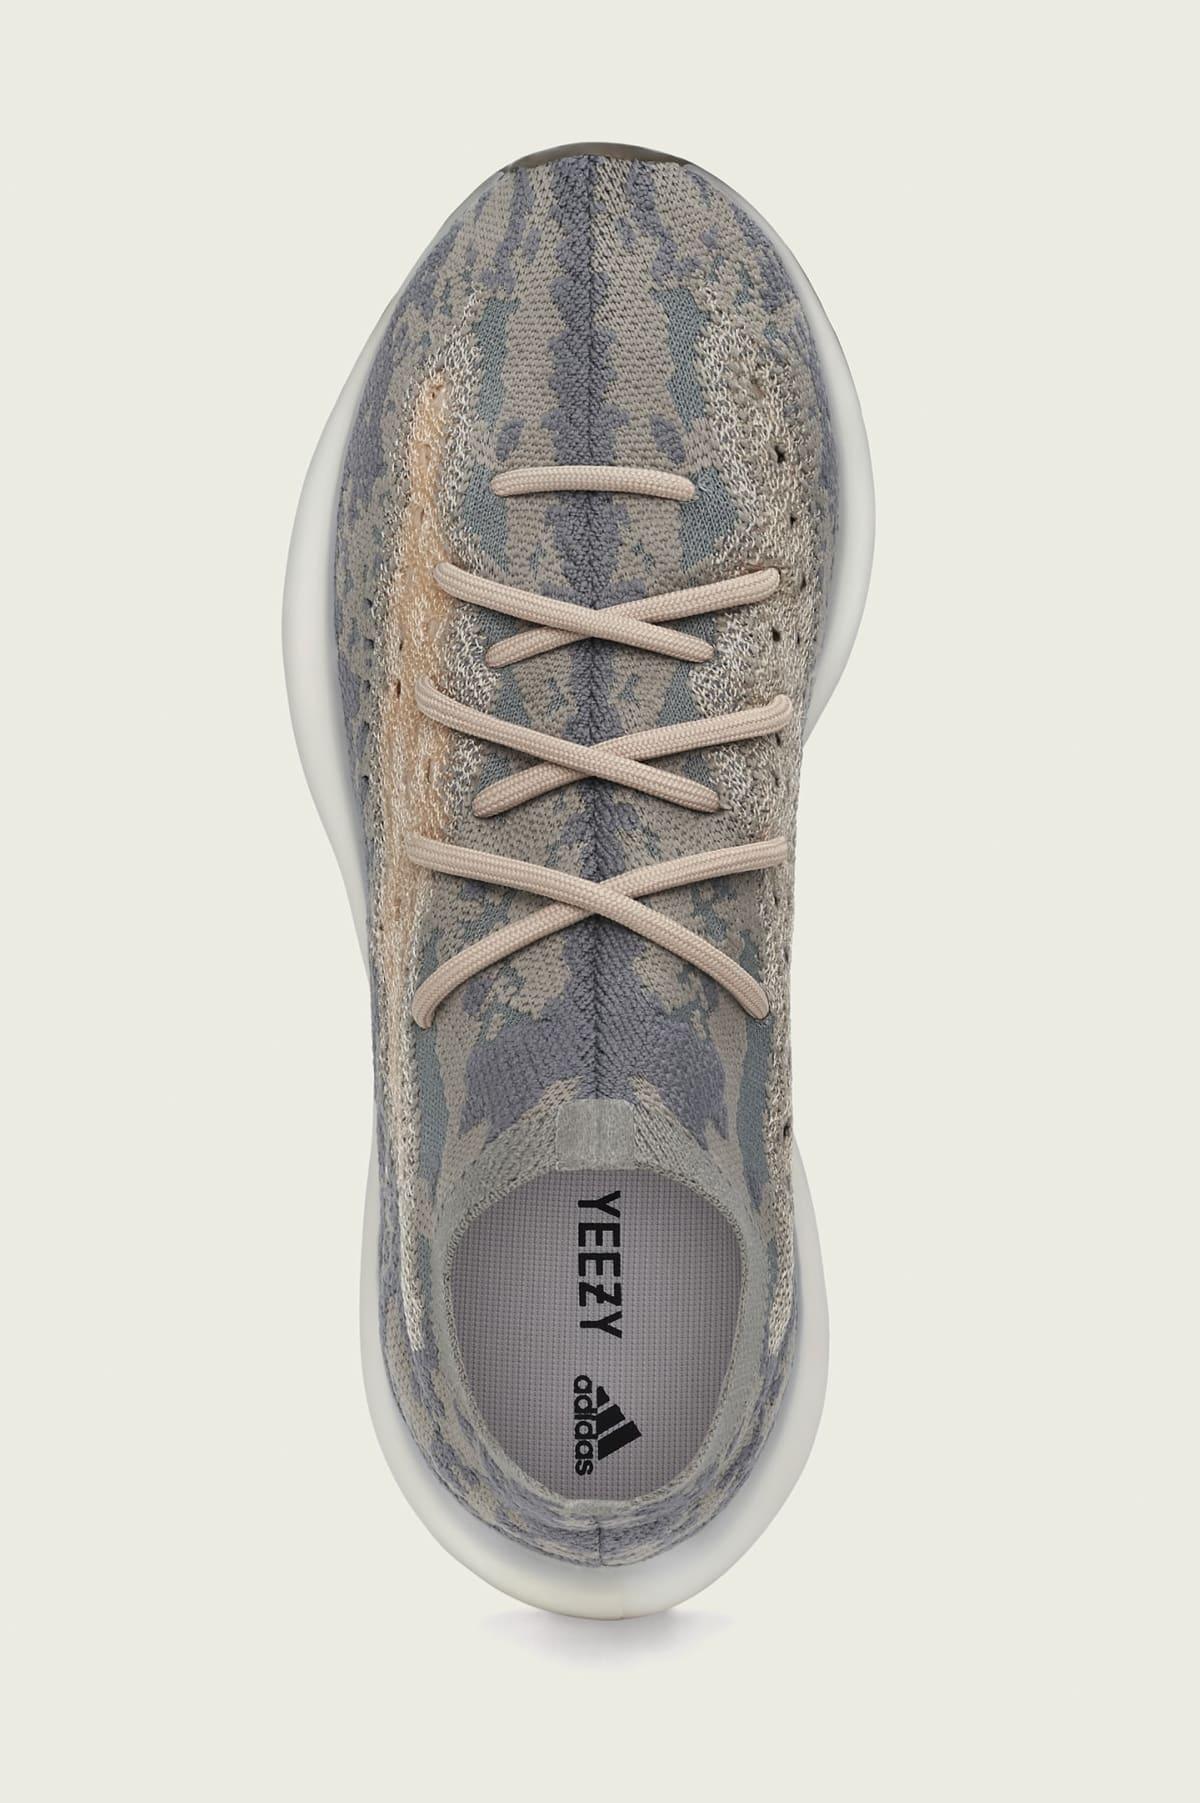 Adidas Yeezy Boost 380 'Mist' FX9764 Top